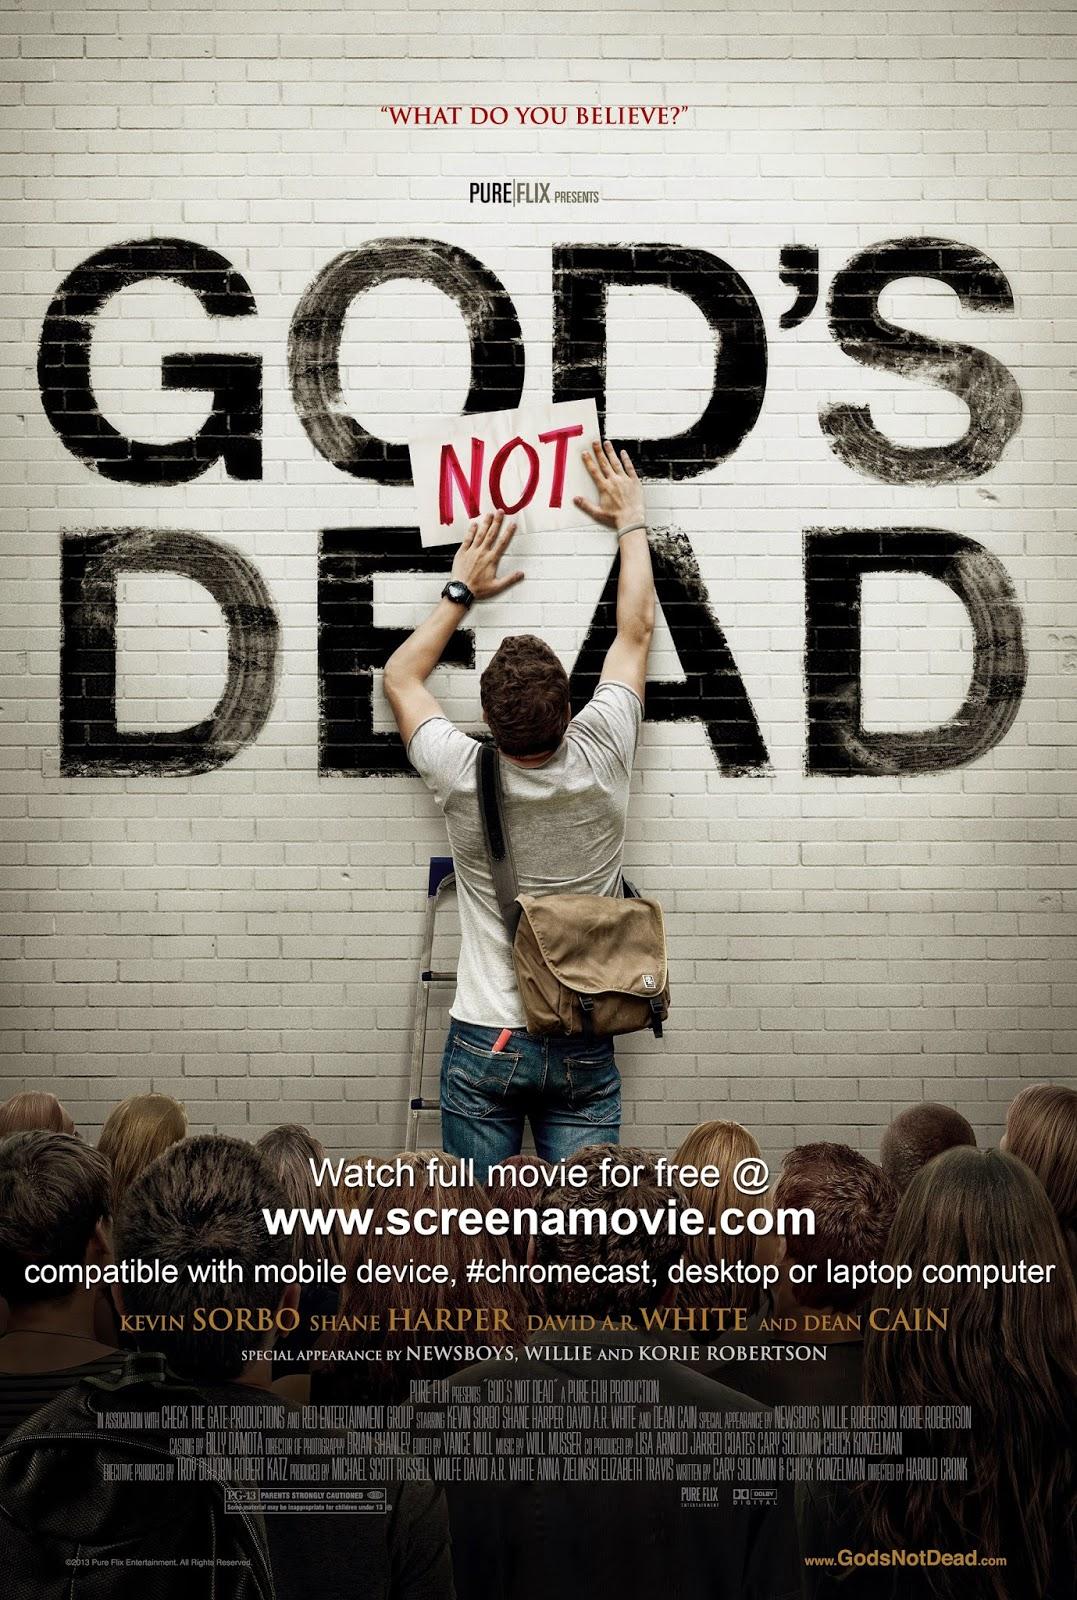 God's Not Dead_@screenamovie